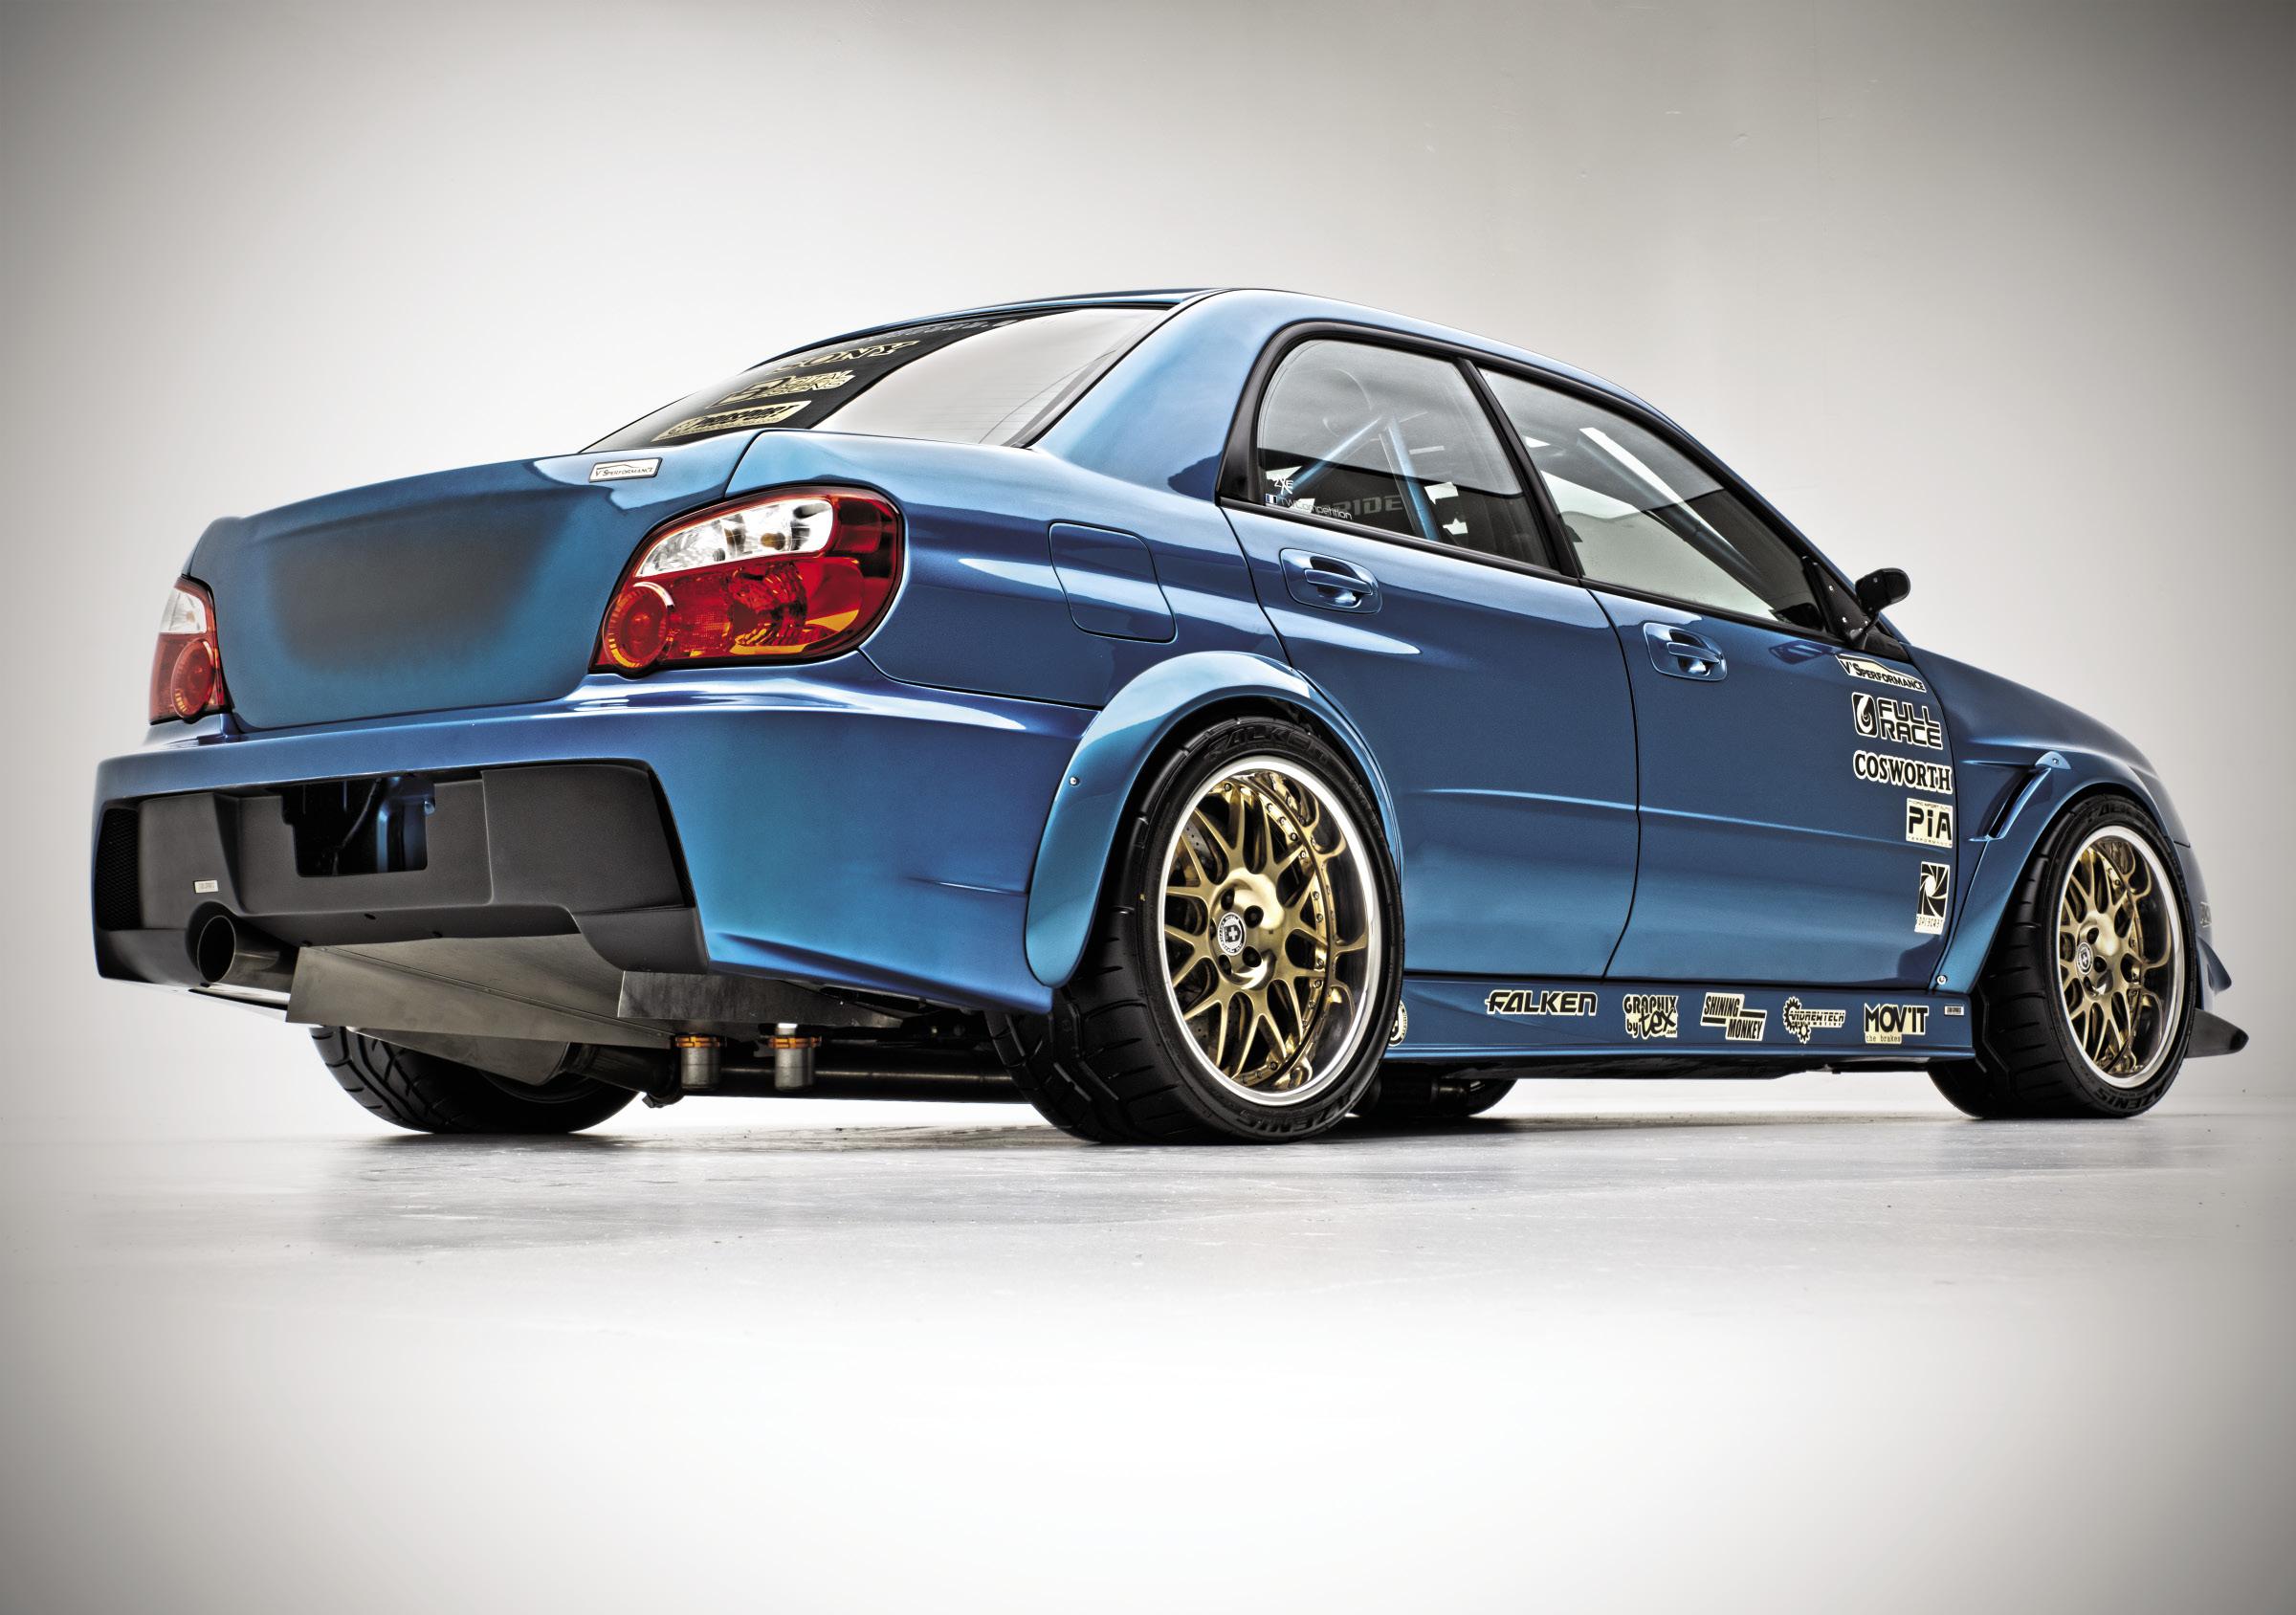 Pasmag Performance Auto And Sound Hard To The Core Chris 2006 Subaru Sti Fuel Filter Location Dunbars Wrx Tr